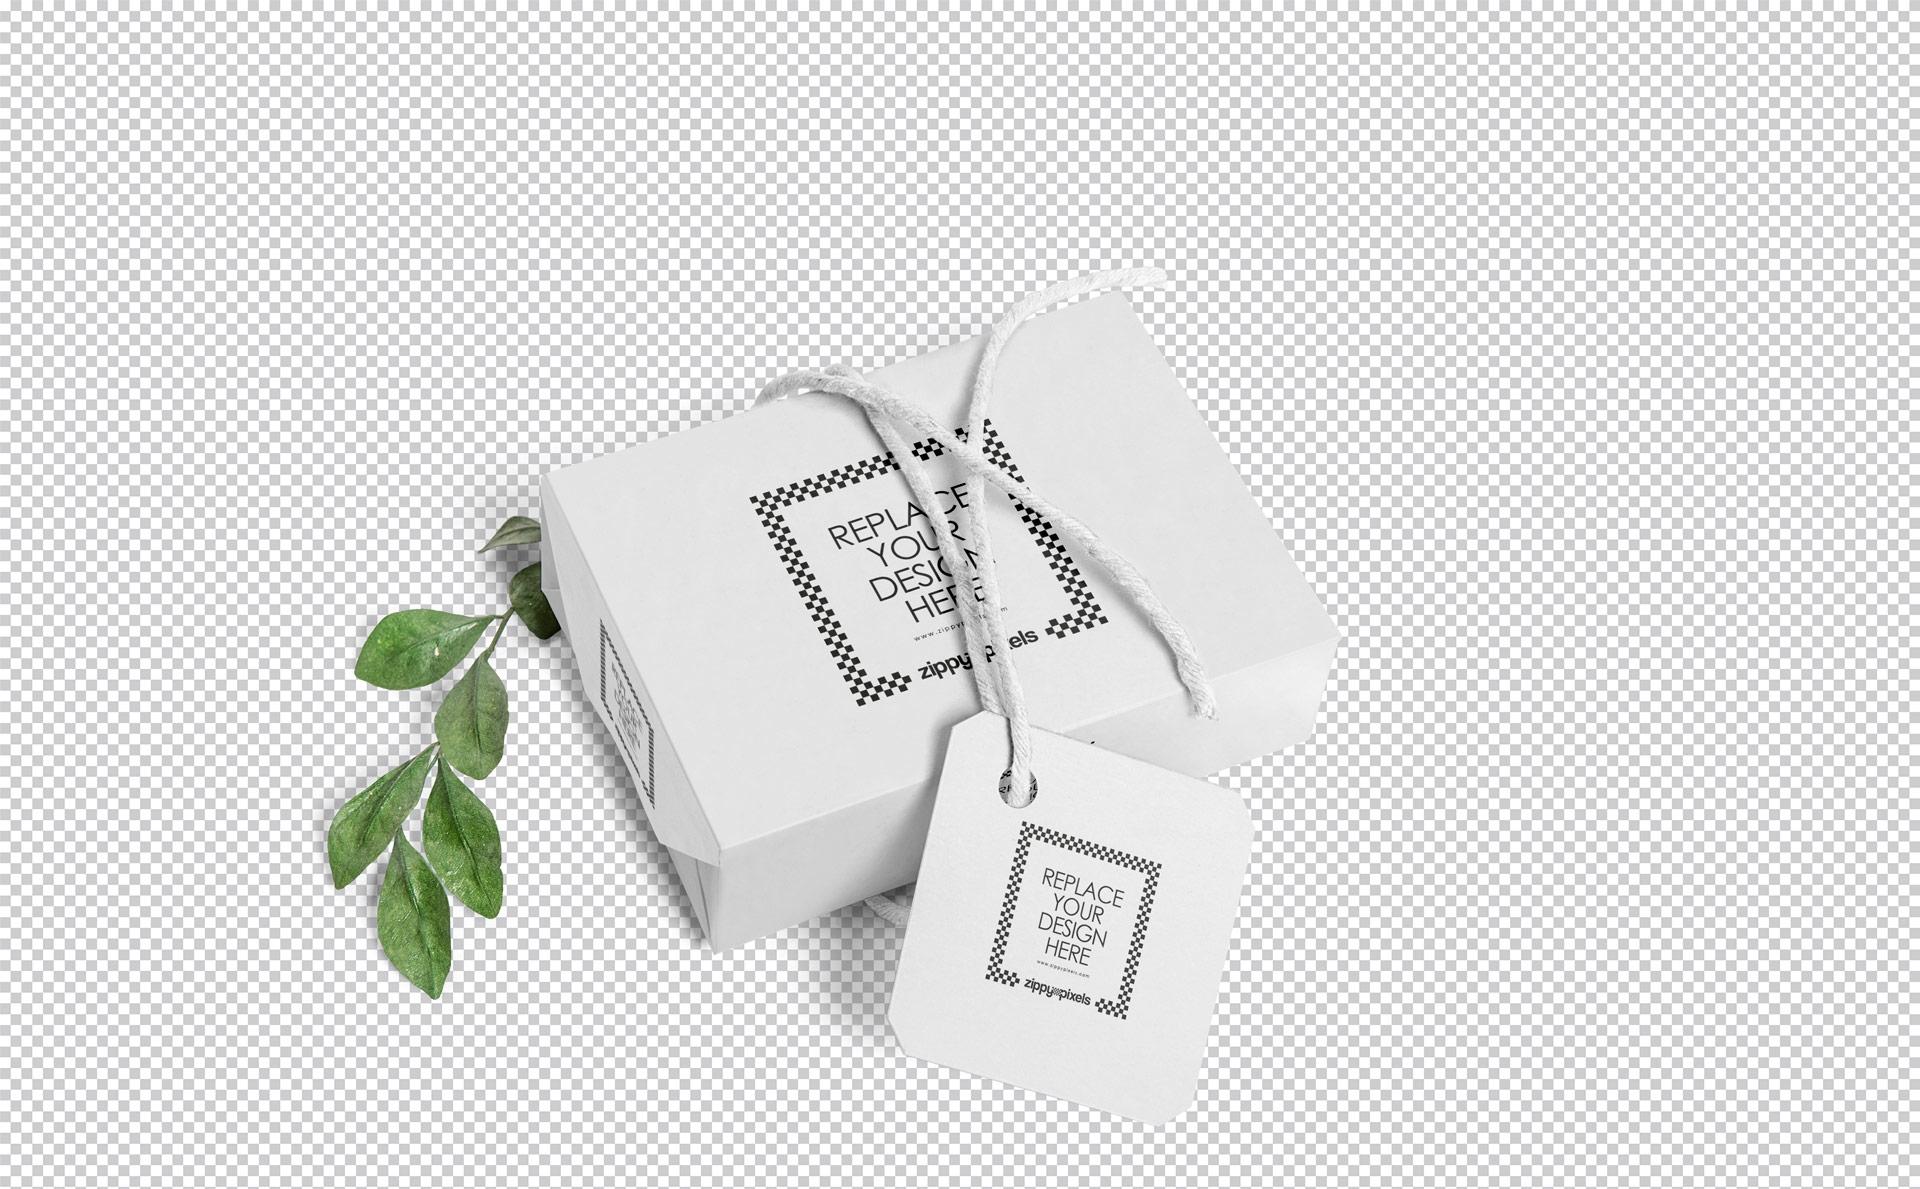 高端精品工艺肥皂包装盒样机Craft Soap Box Mockup